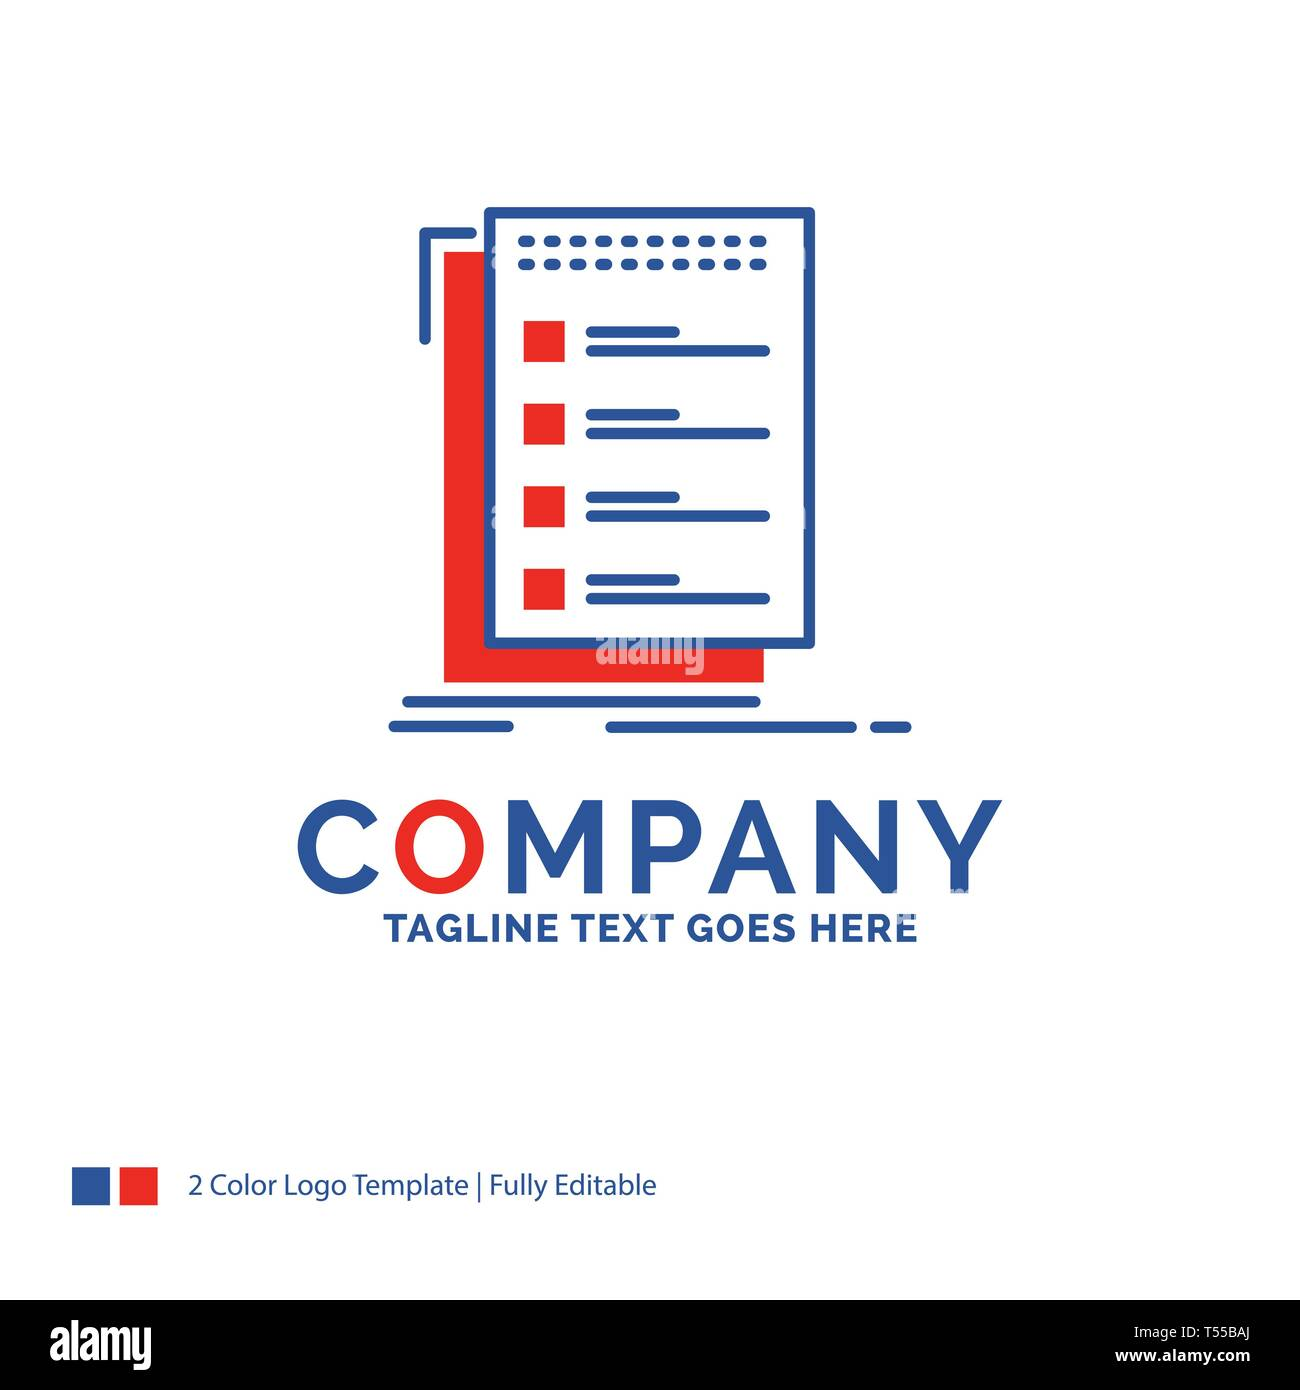 Company Name Logo Design For Check Checklist List Task